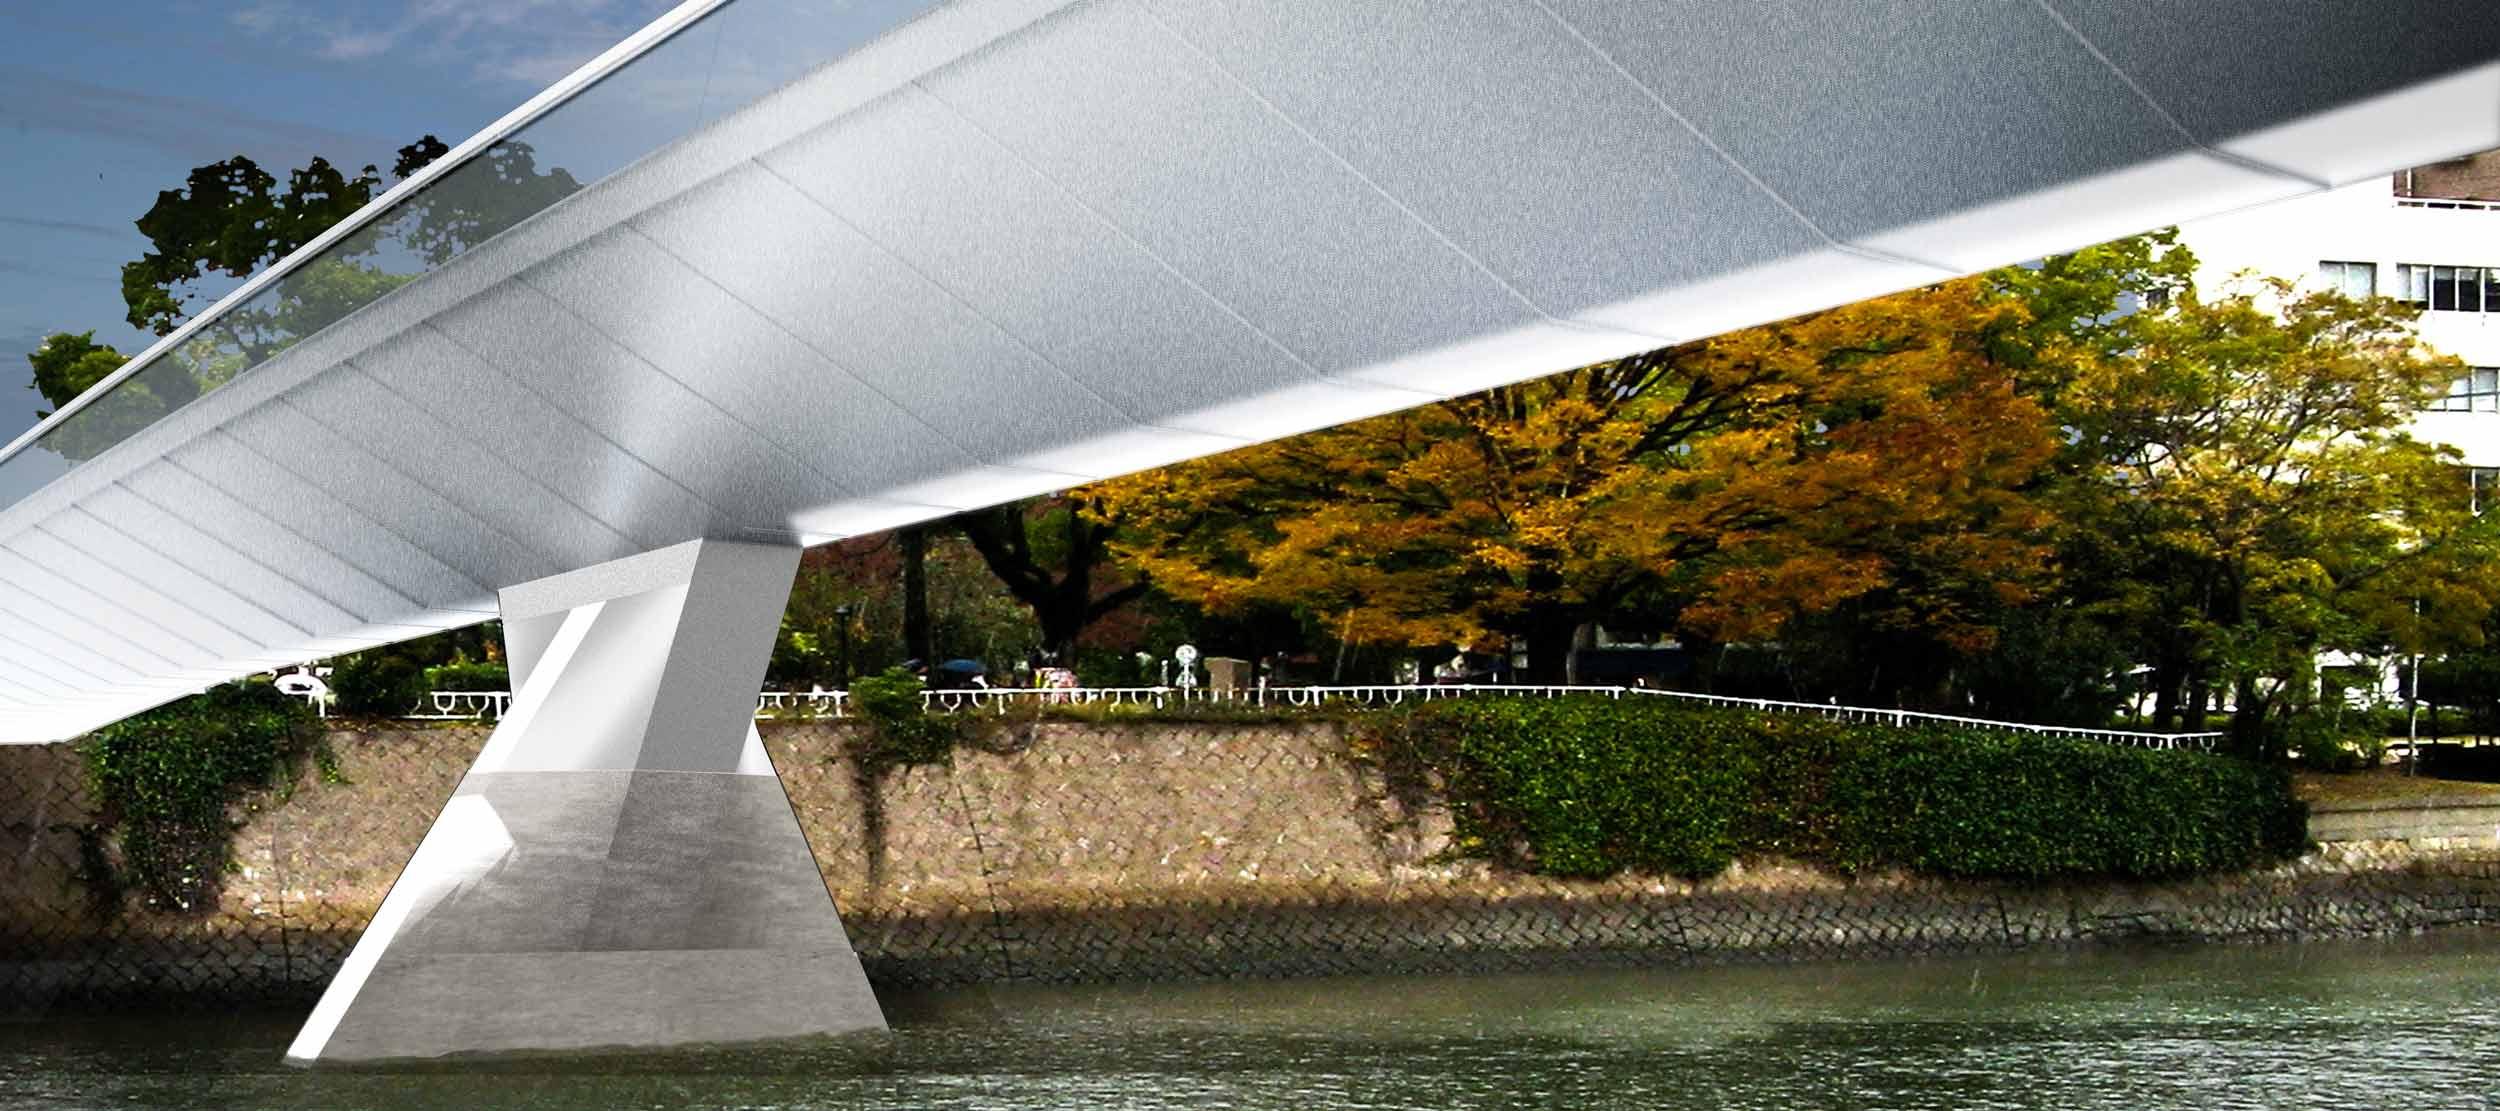 hiroshima-peace-bridge---rendering-(8)_farve.jpg